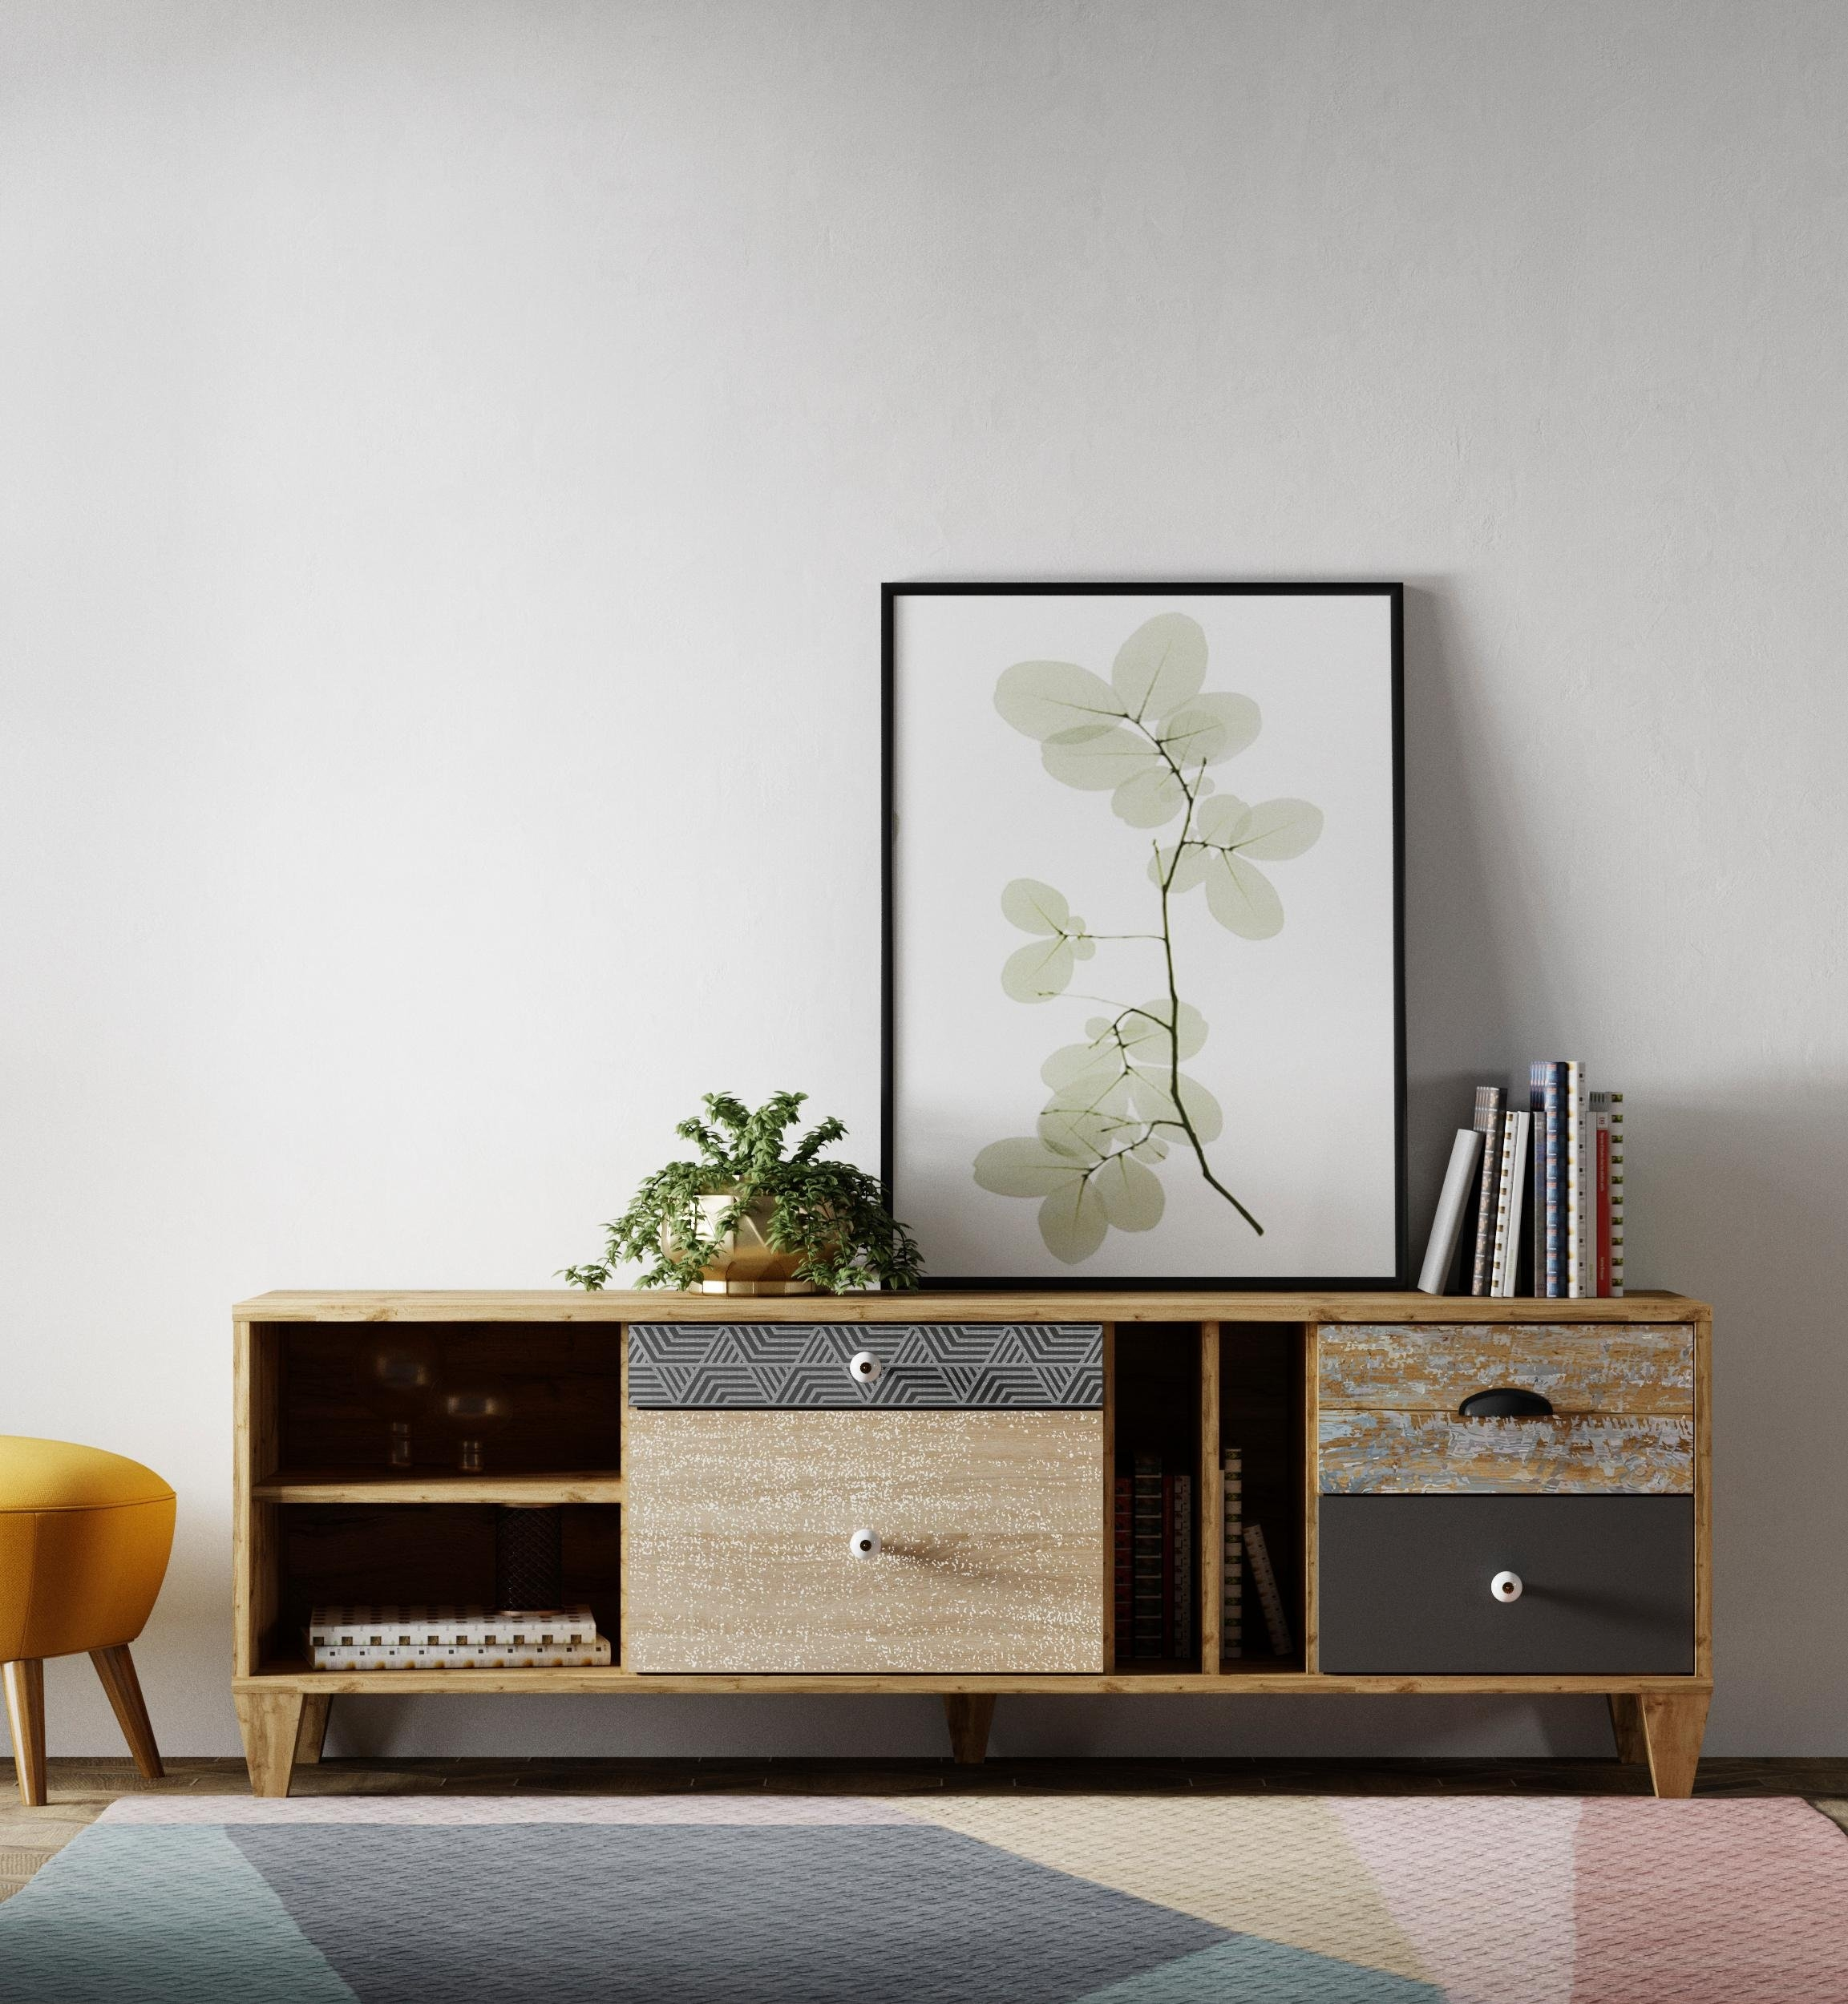 Home affaire tv-meubel »Oker« - gratis ruilen op otto.nl